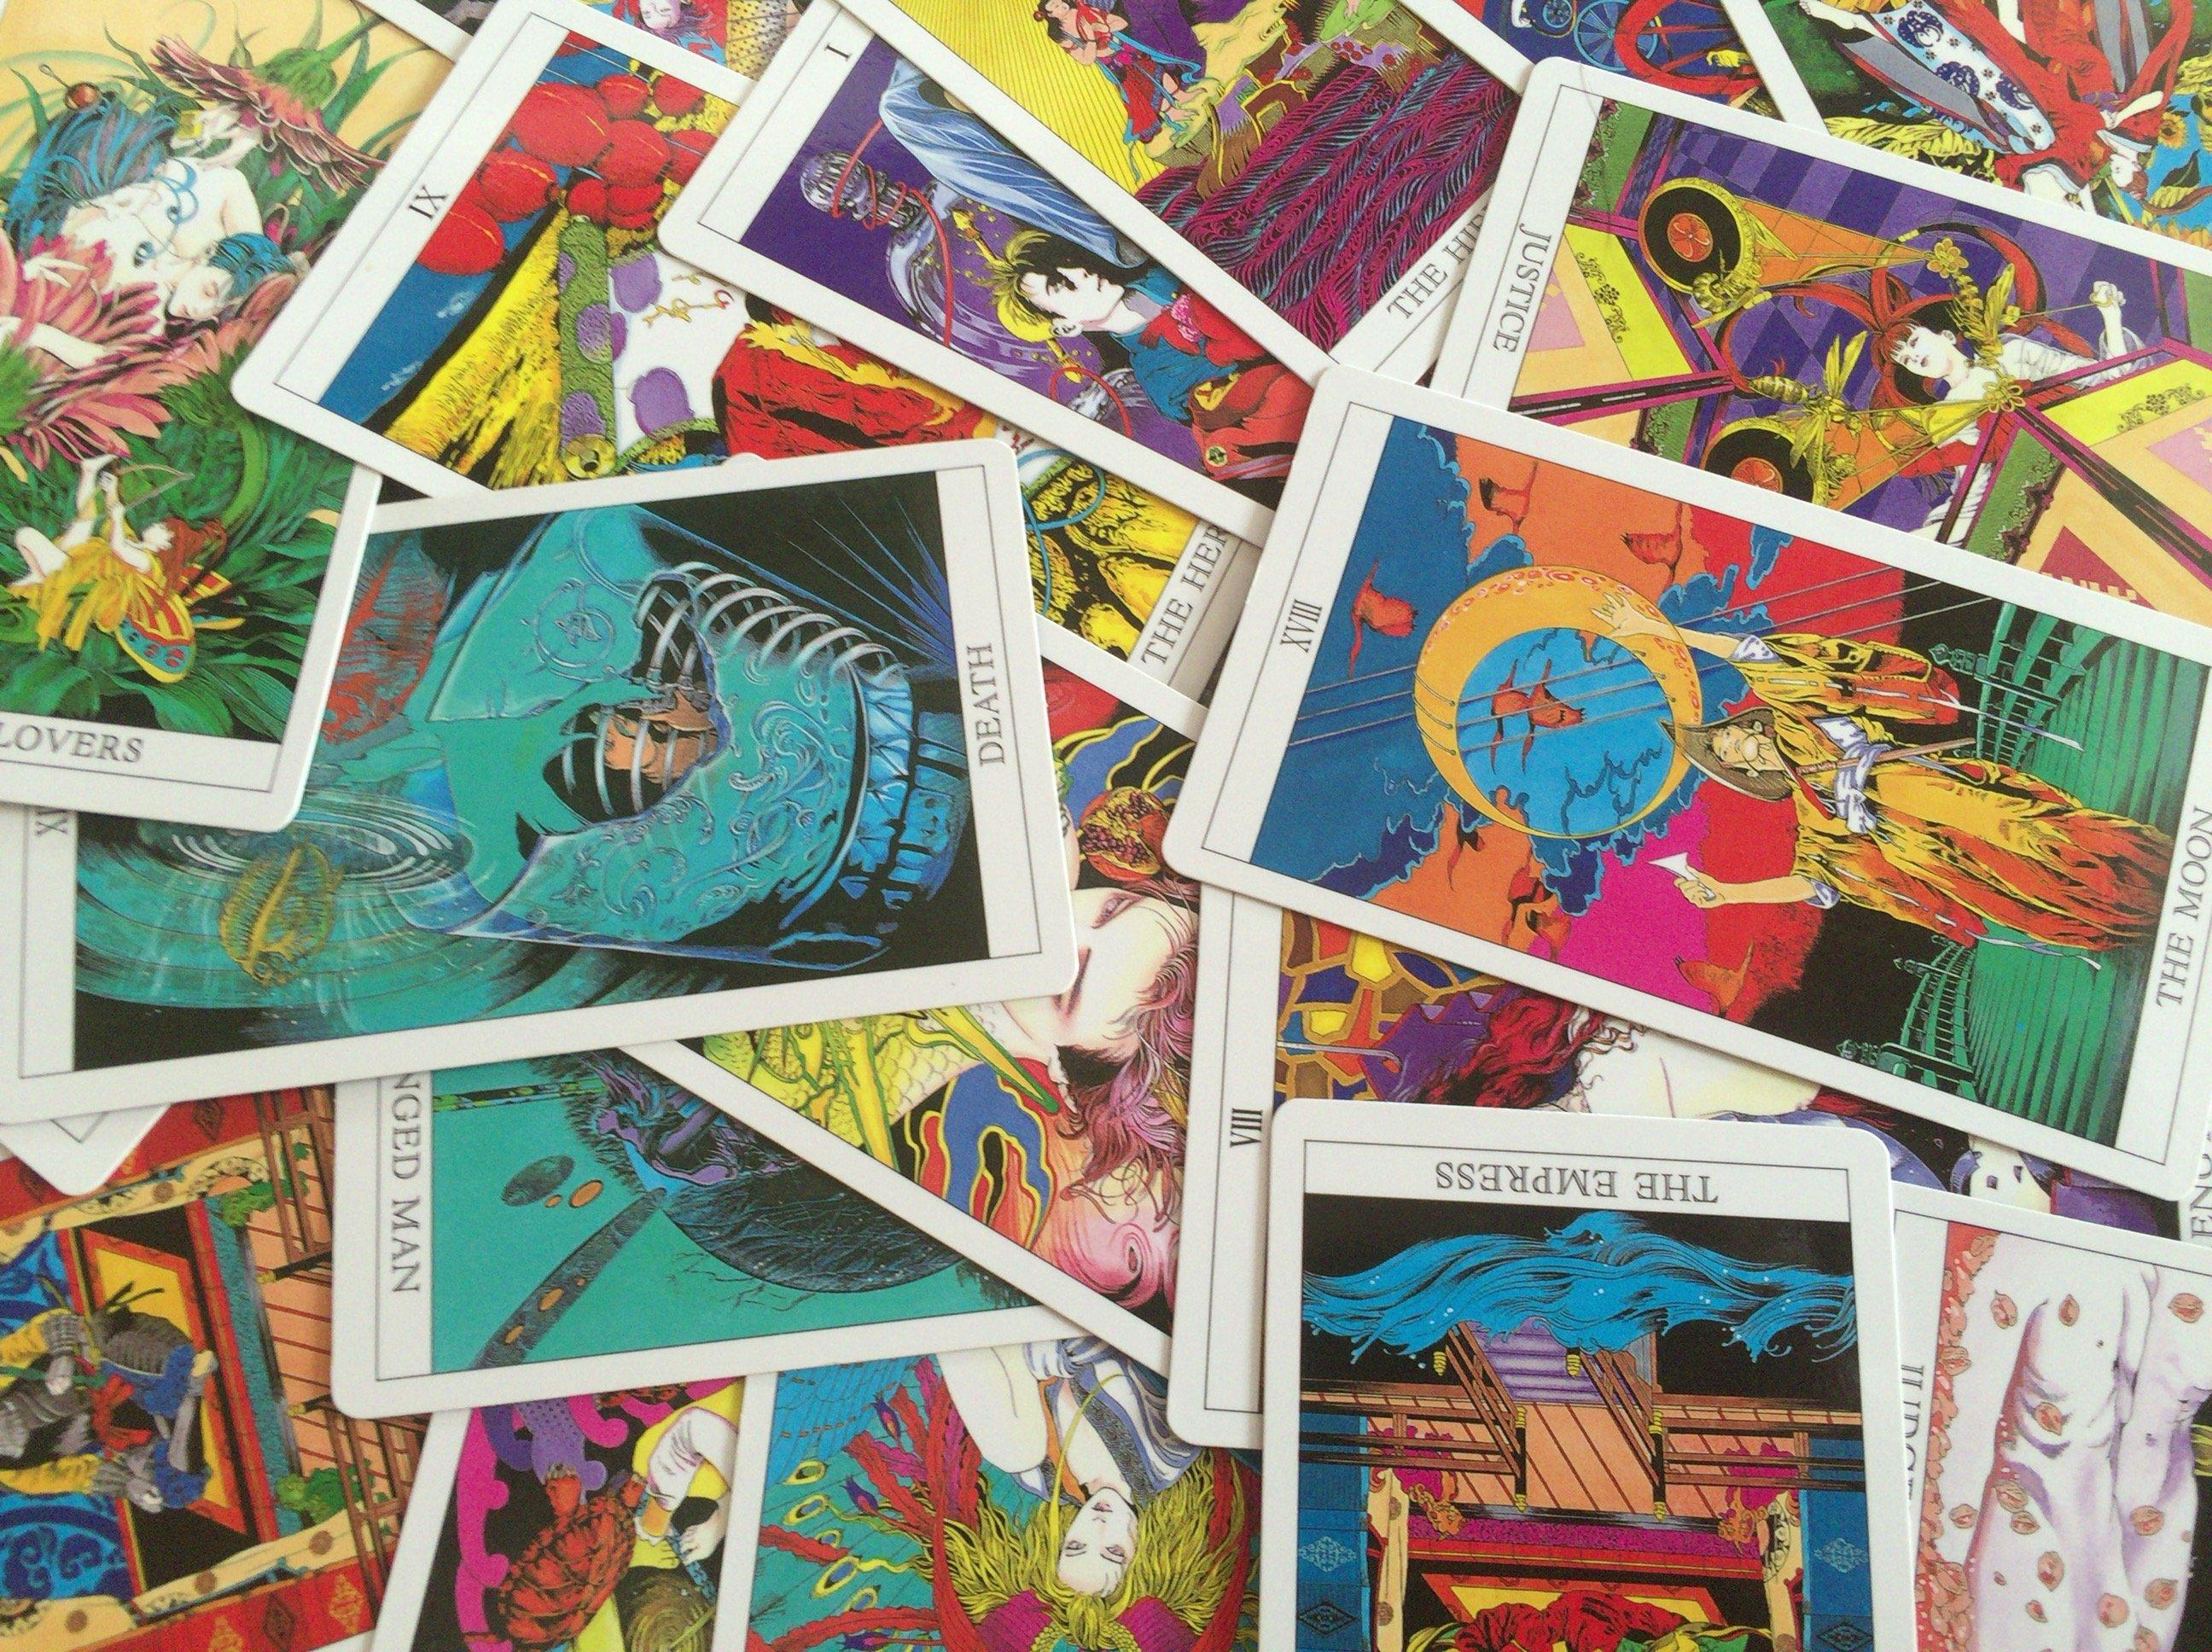 image 11.jpg?resize=1200,630 - オカルトから漫画まで!作家で超常現象研究家の飛鳥昭雄ってどんな人?